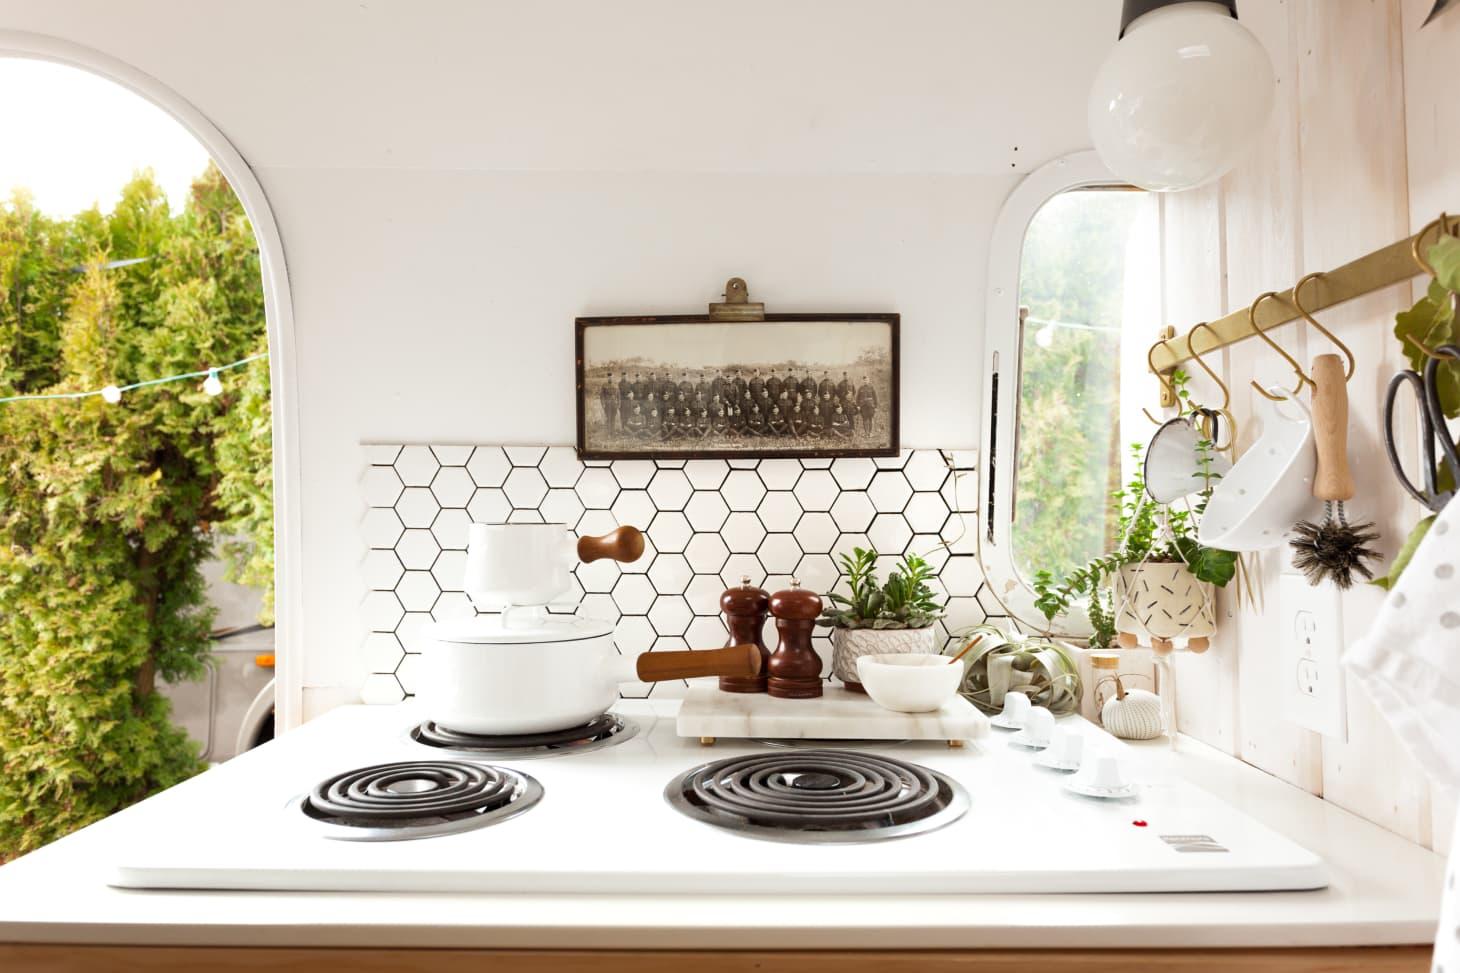 Best Small Kitchen Design Ideas - Smart Small Kitchen Solutions ...